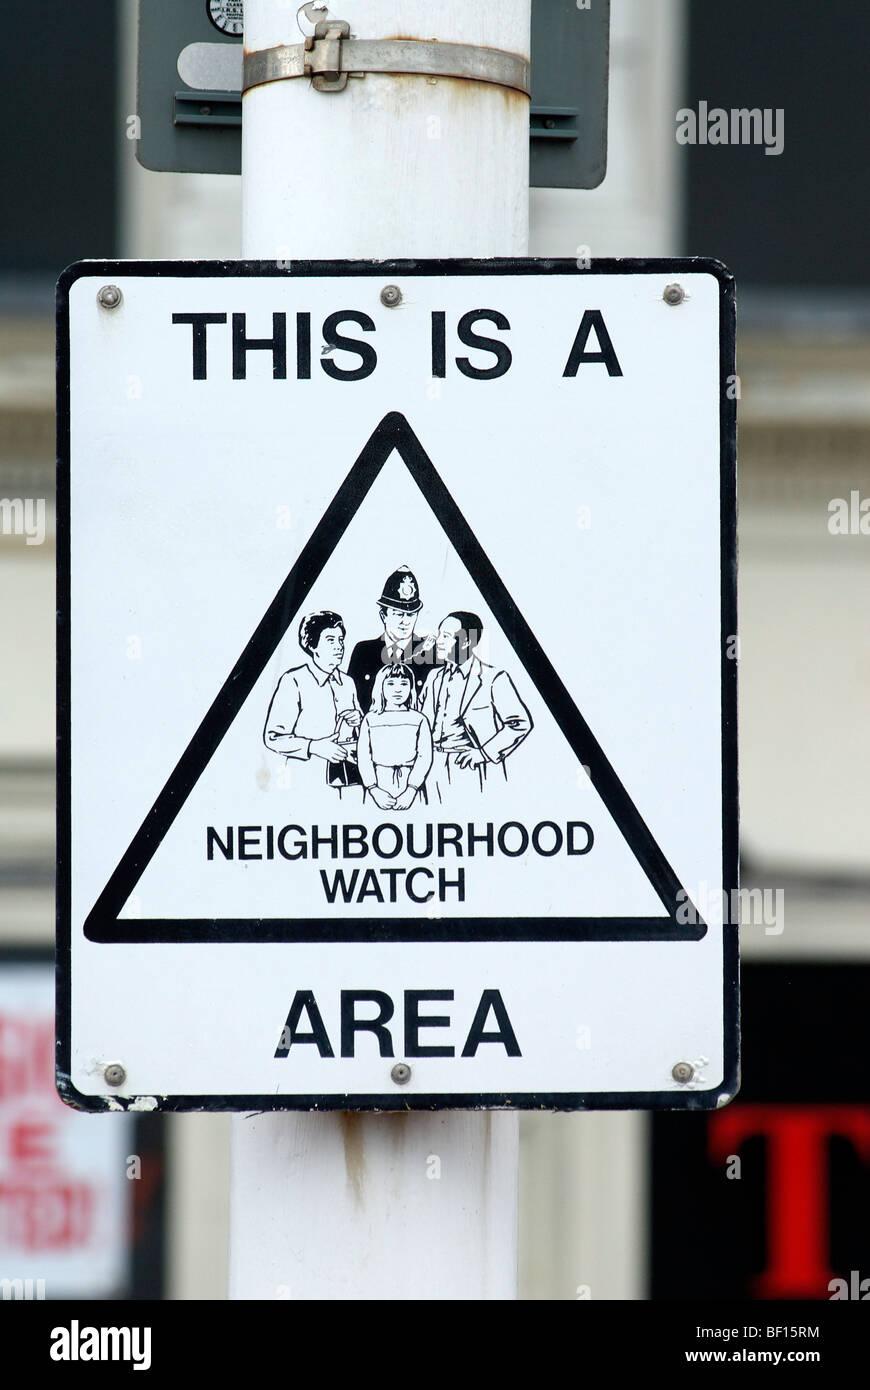 Neighbourhood Watch Area Sign - Sep 2009 - Stock Image